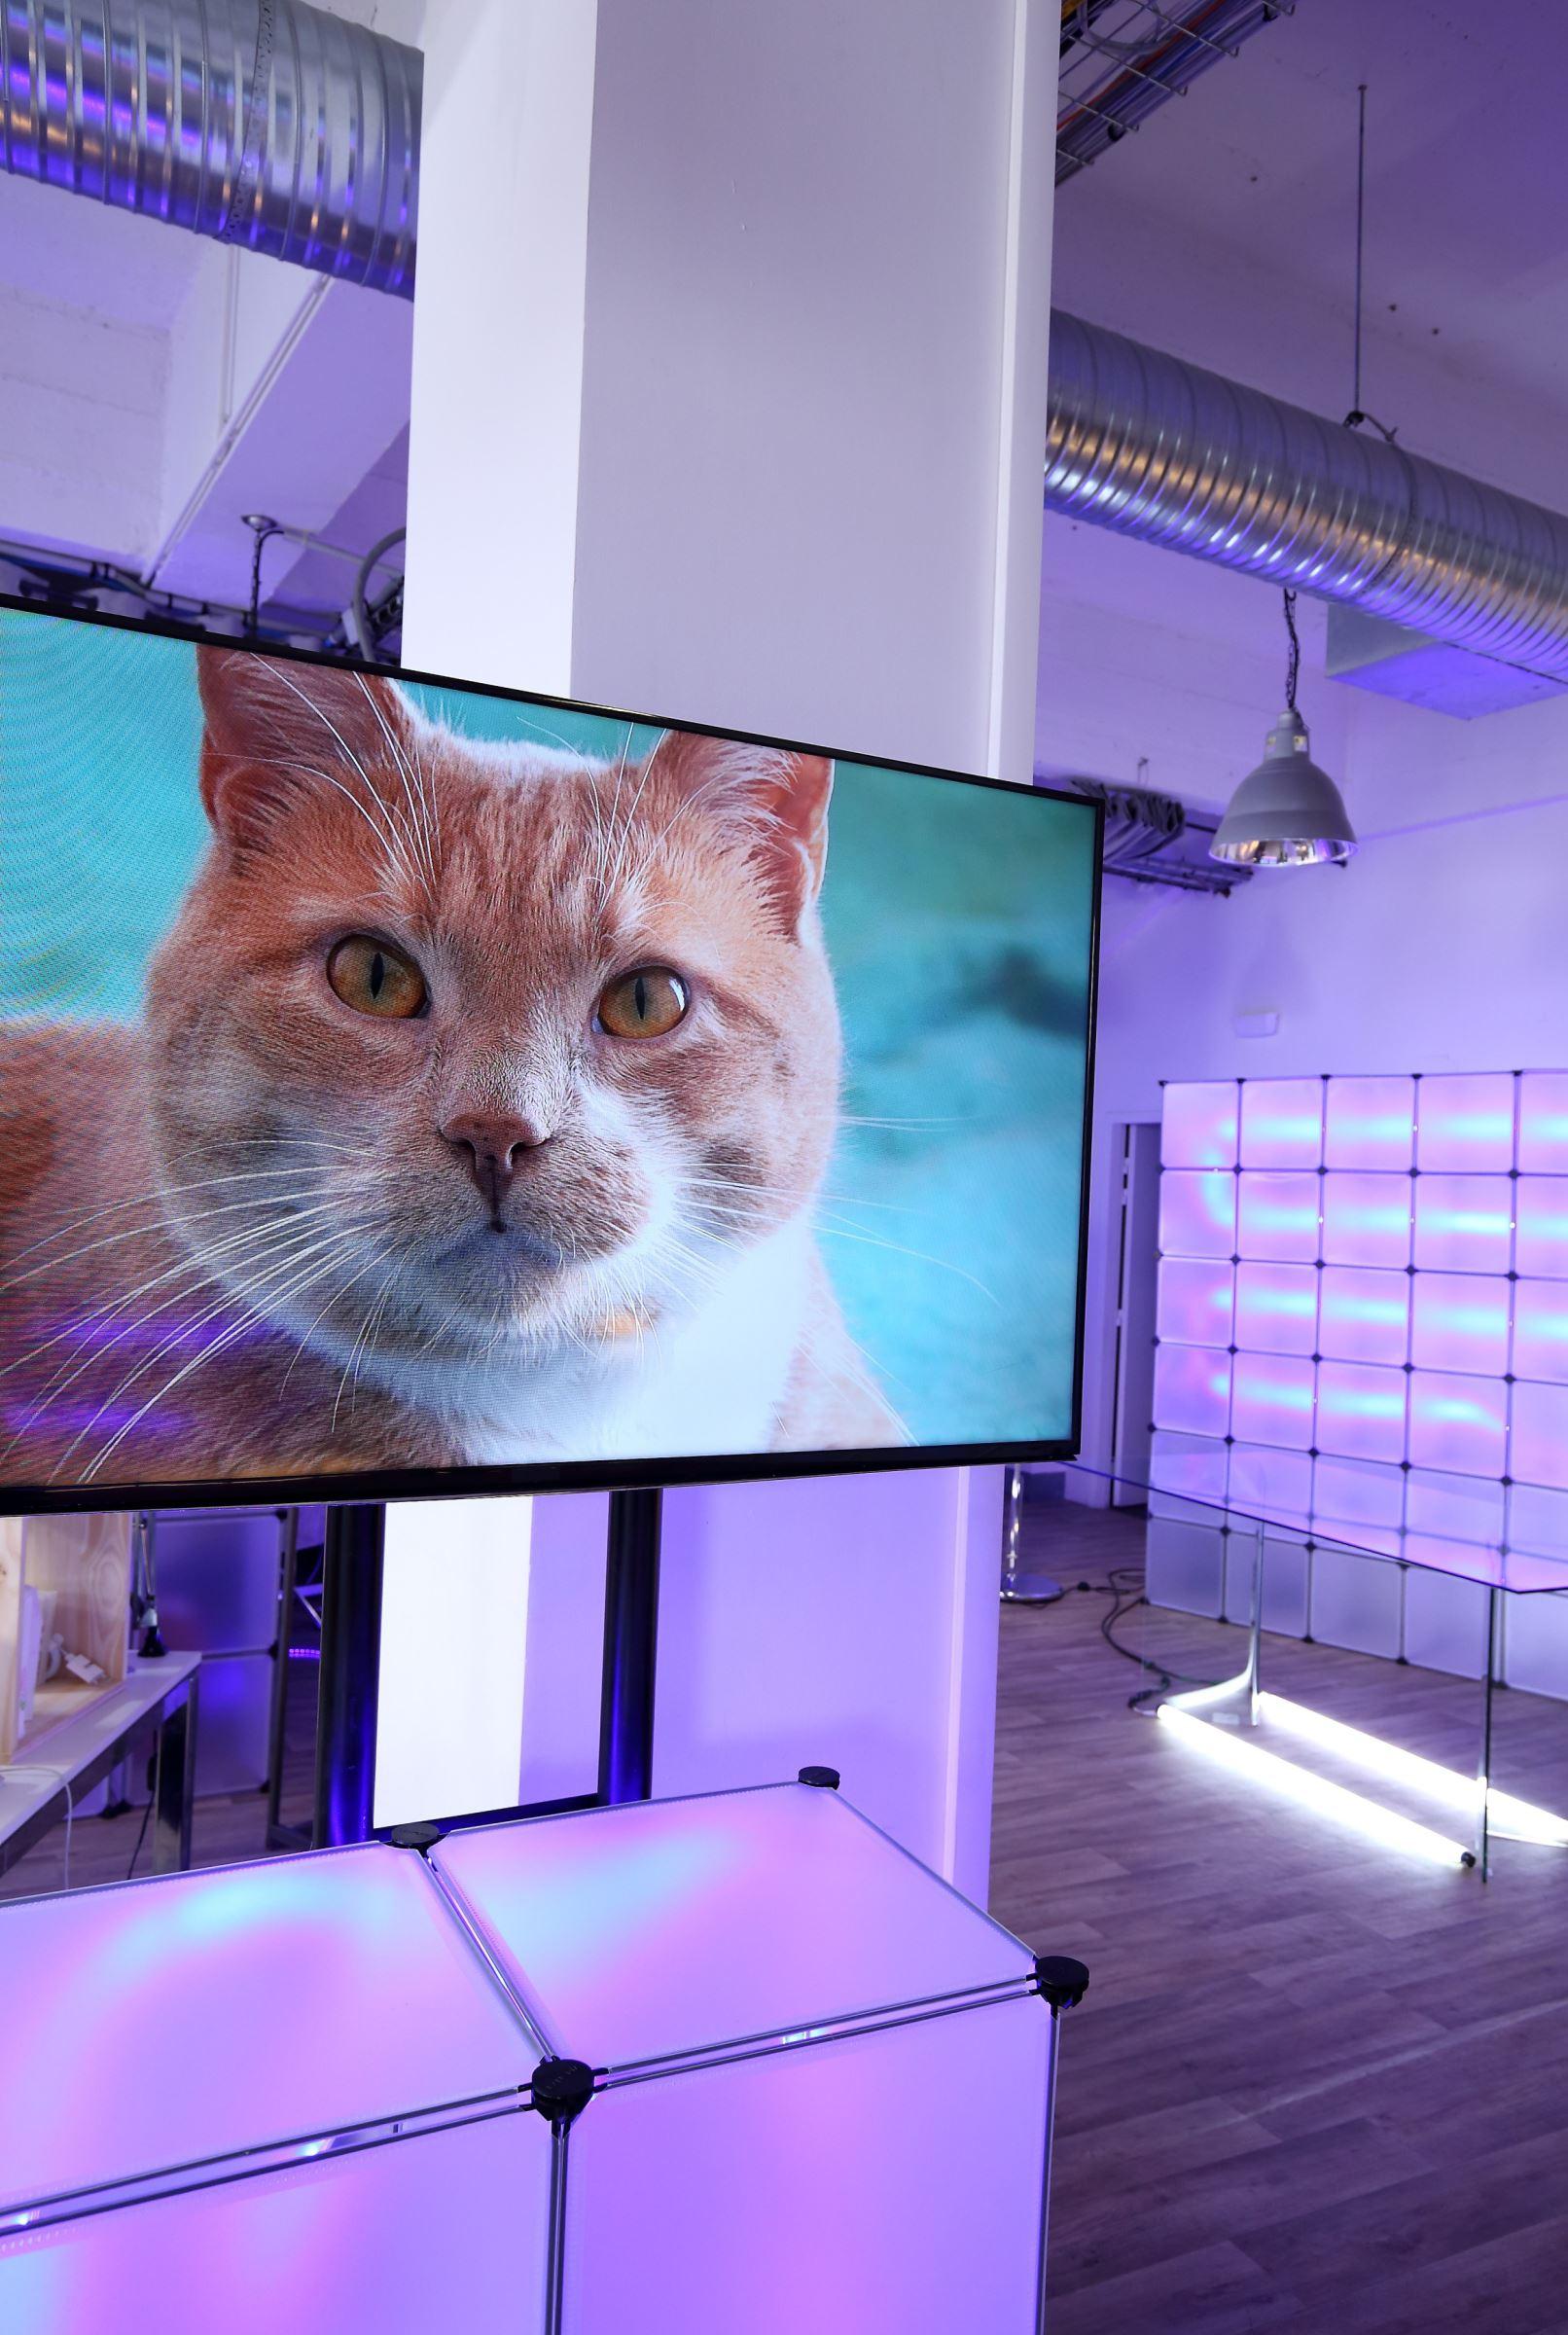 La Vie Secrete Des Chats Saison 3 : secrete, chats, saison, Secrète, Chats, Secrets, Saison, Télé